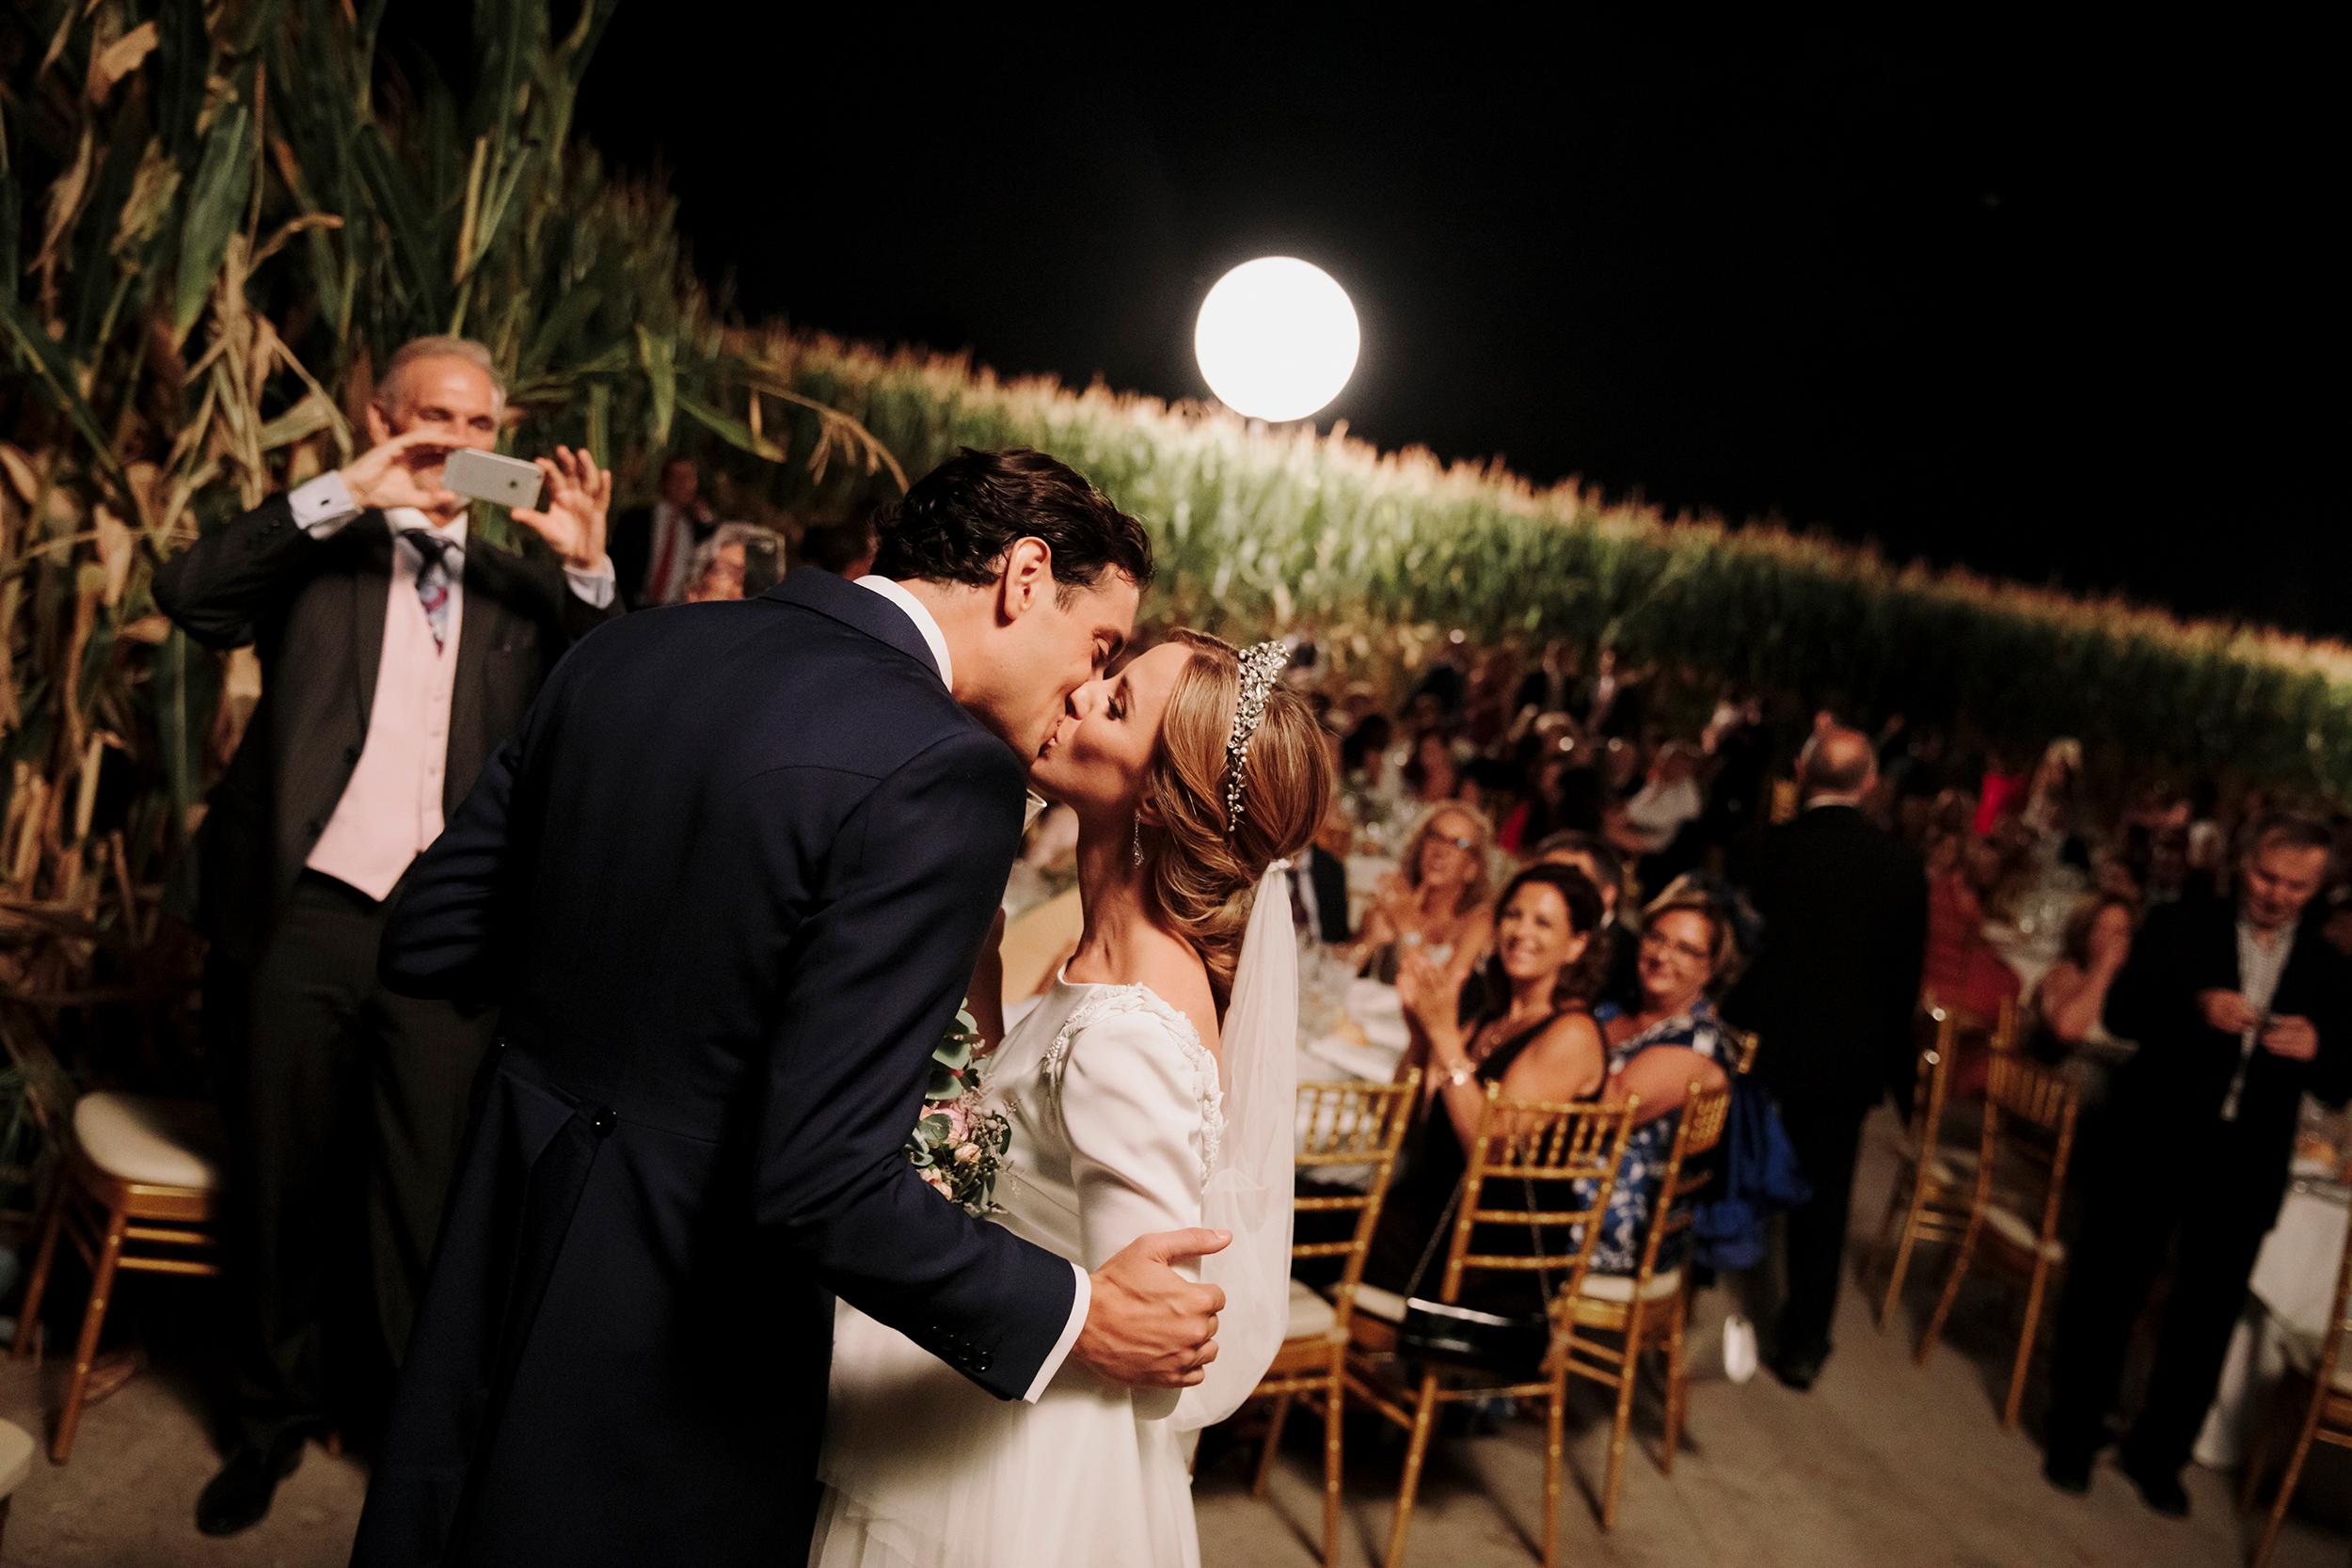 fotografo-bodas-granada-catedral-sagrario-jose-reyes_073.jpg